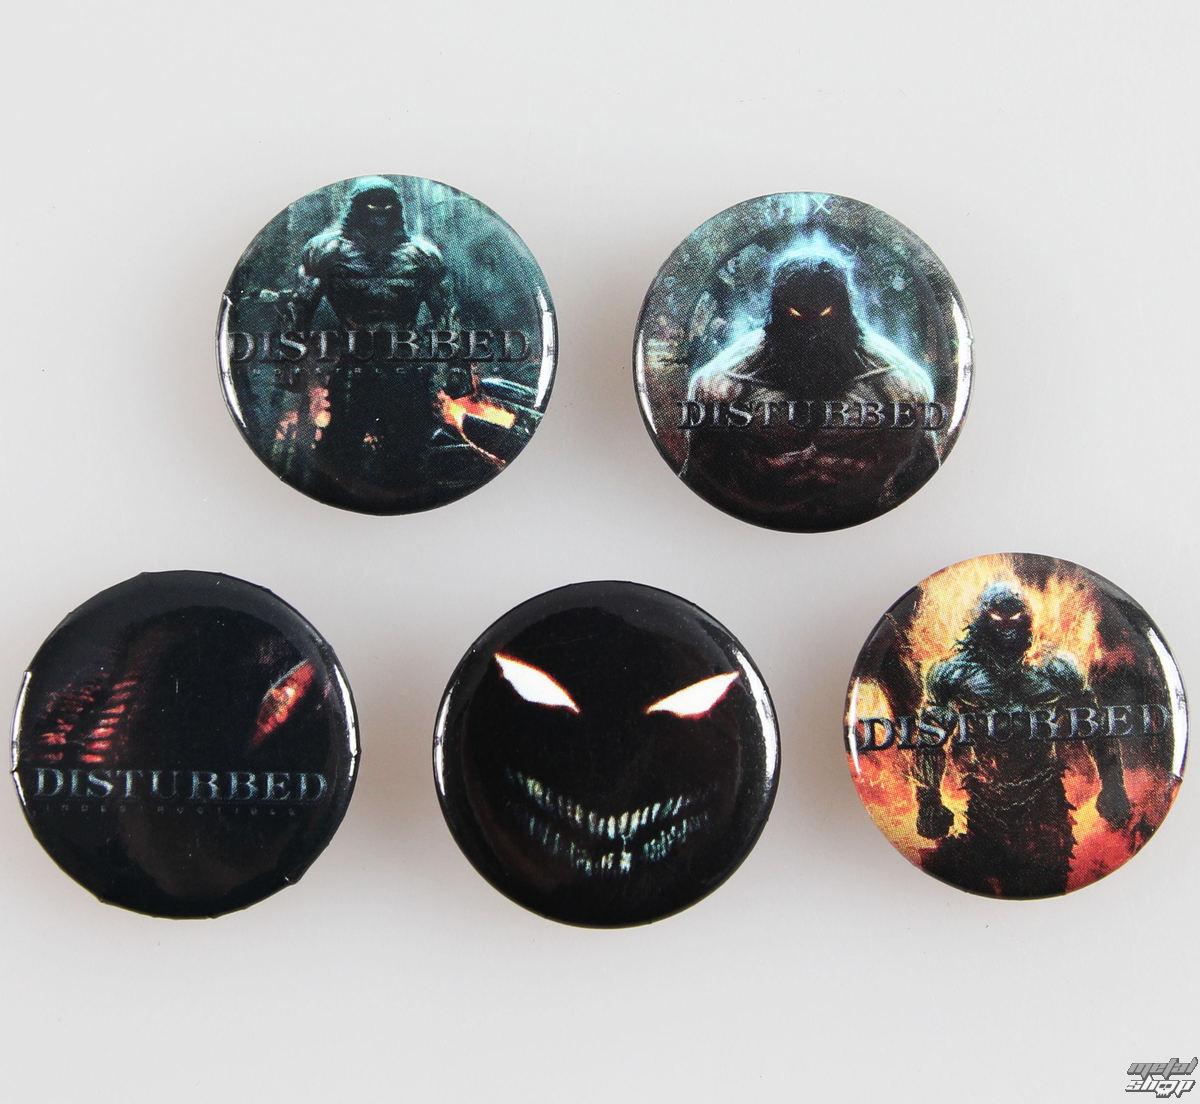 odznaky Disturbed - Indestruct 5 Btn - BRAVADO - 2044100B0